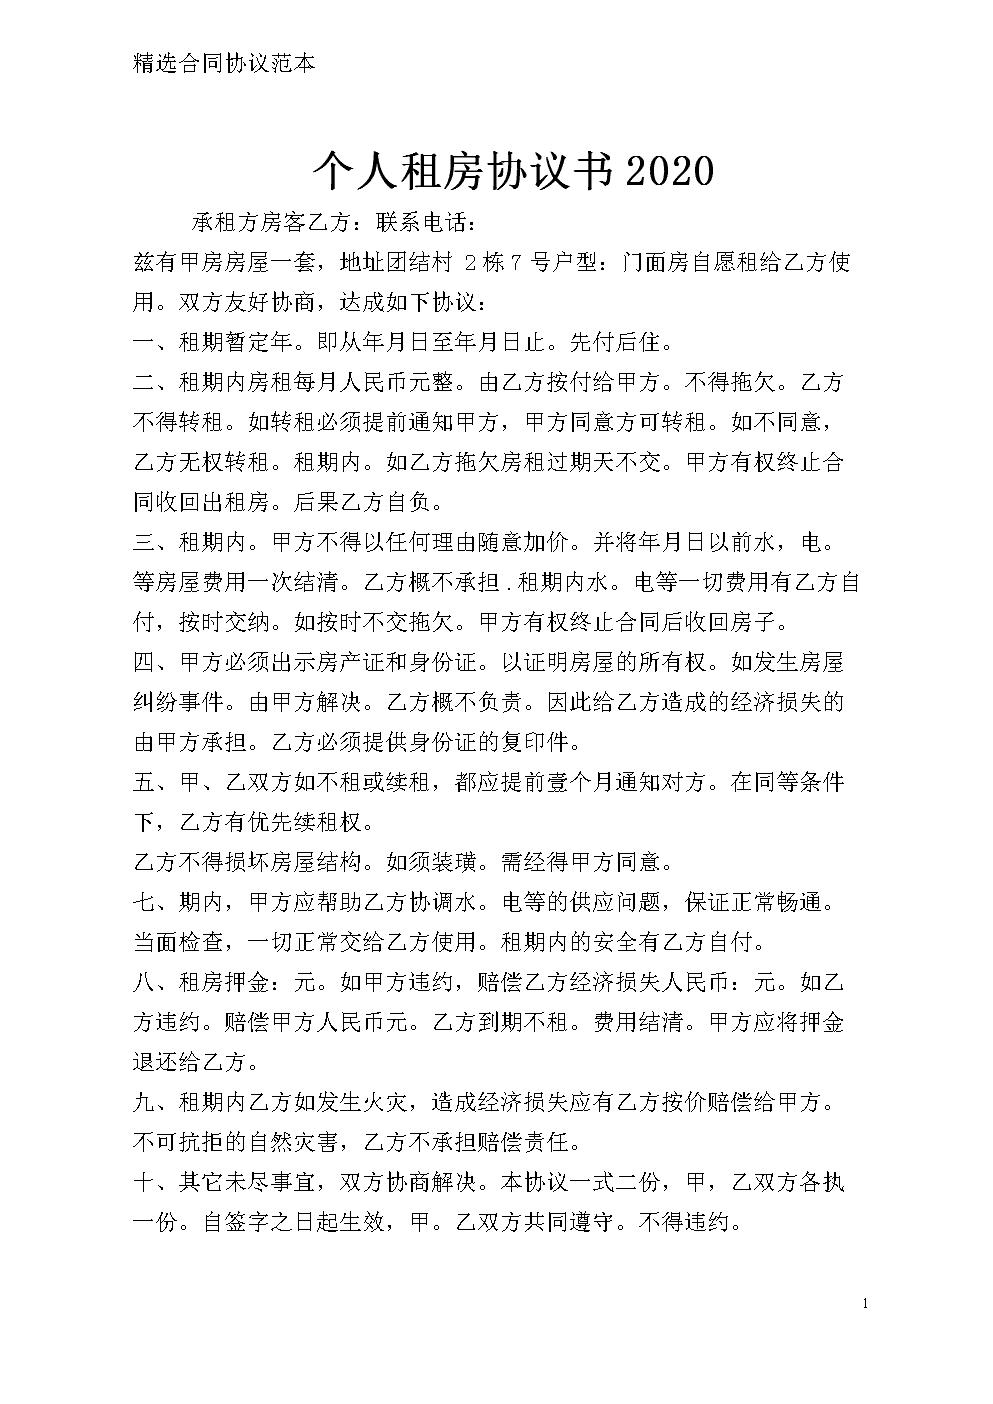 个人租房协议书2020.doc